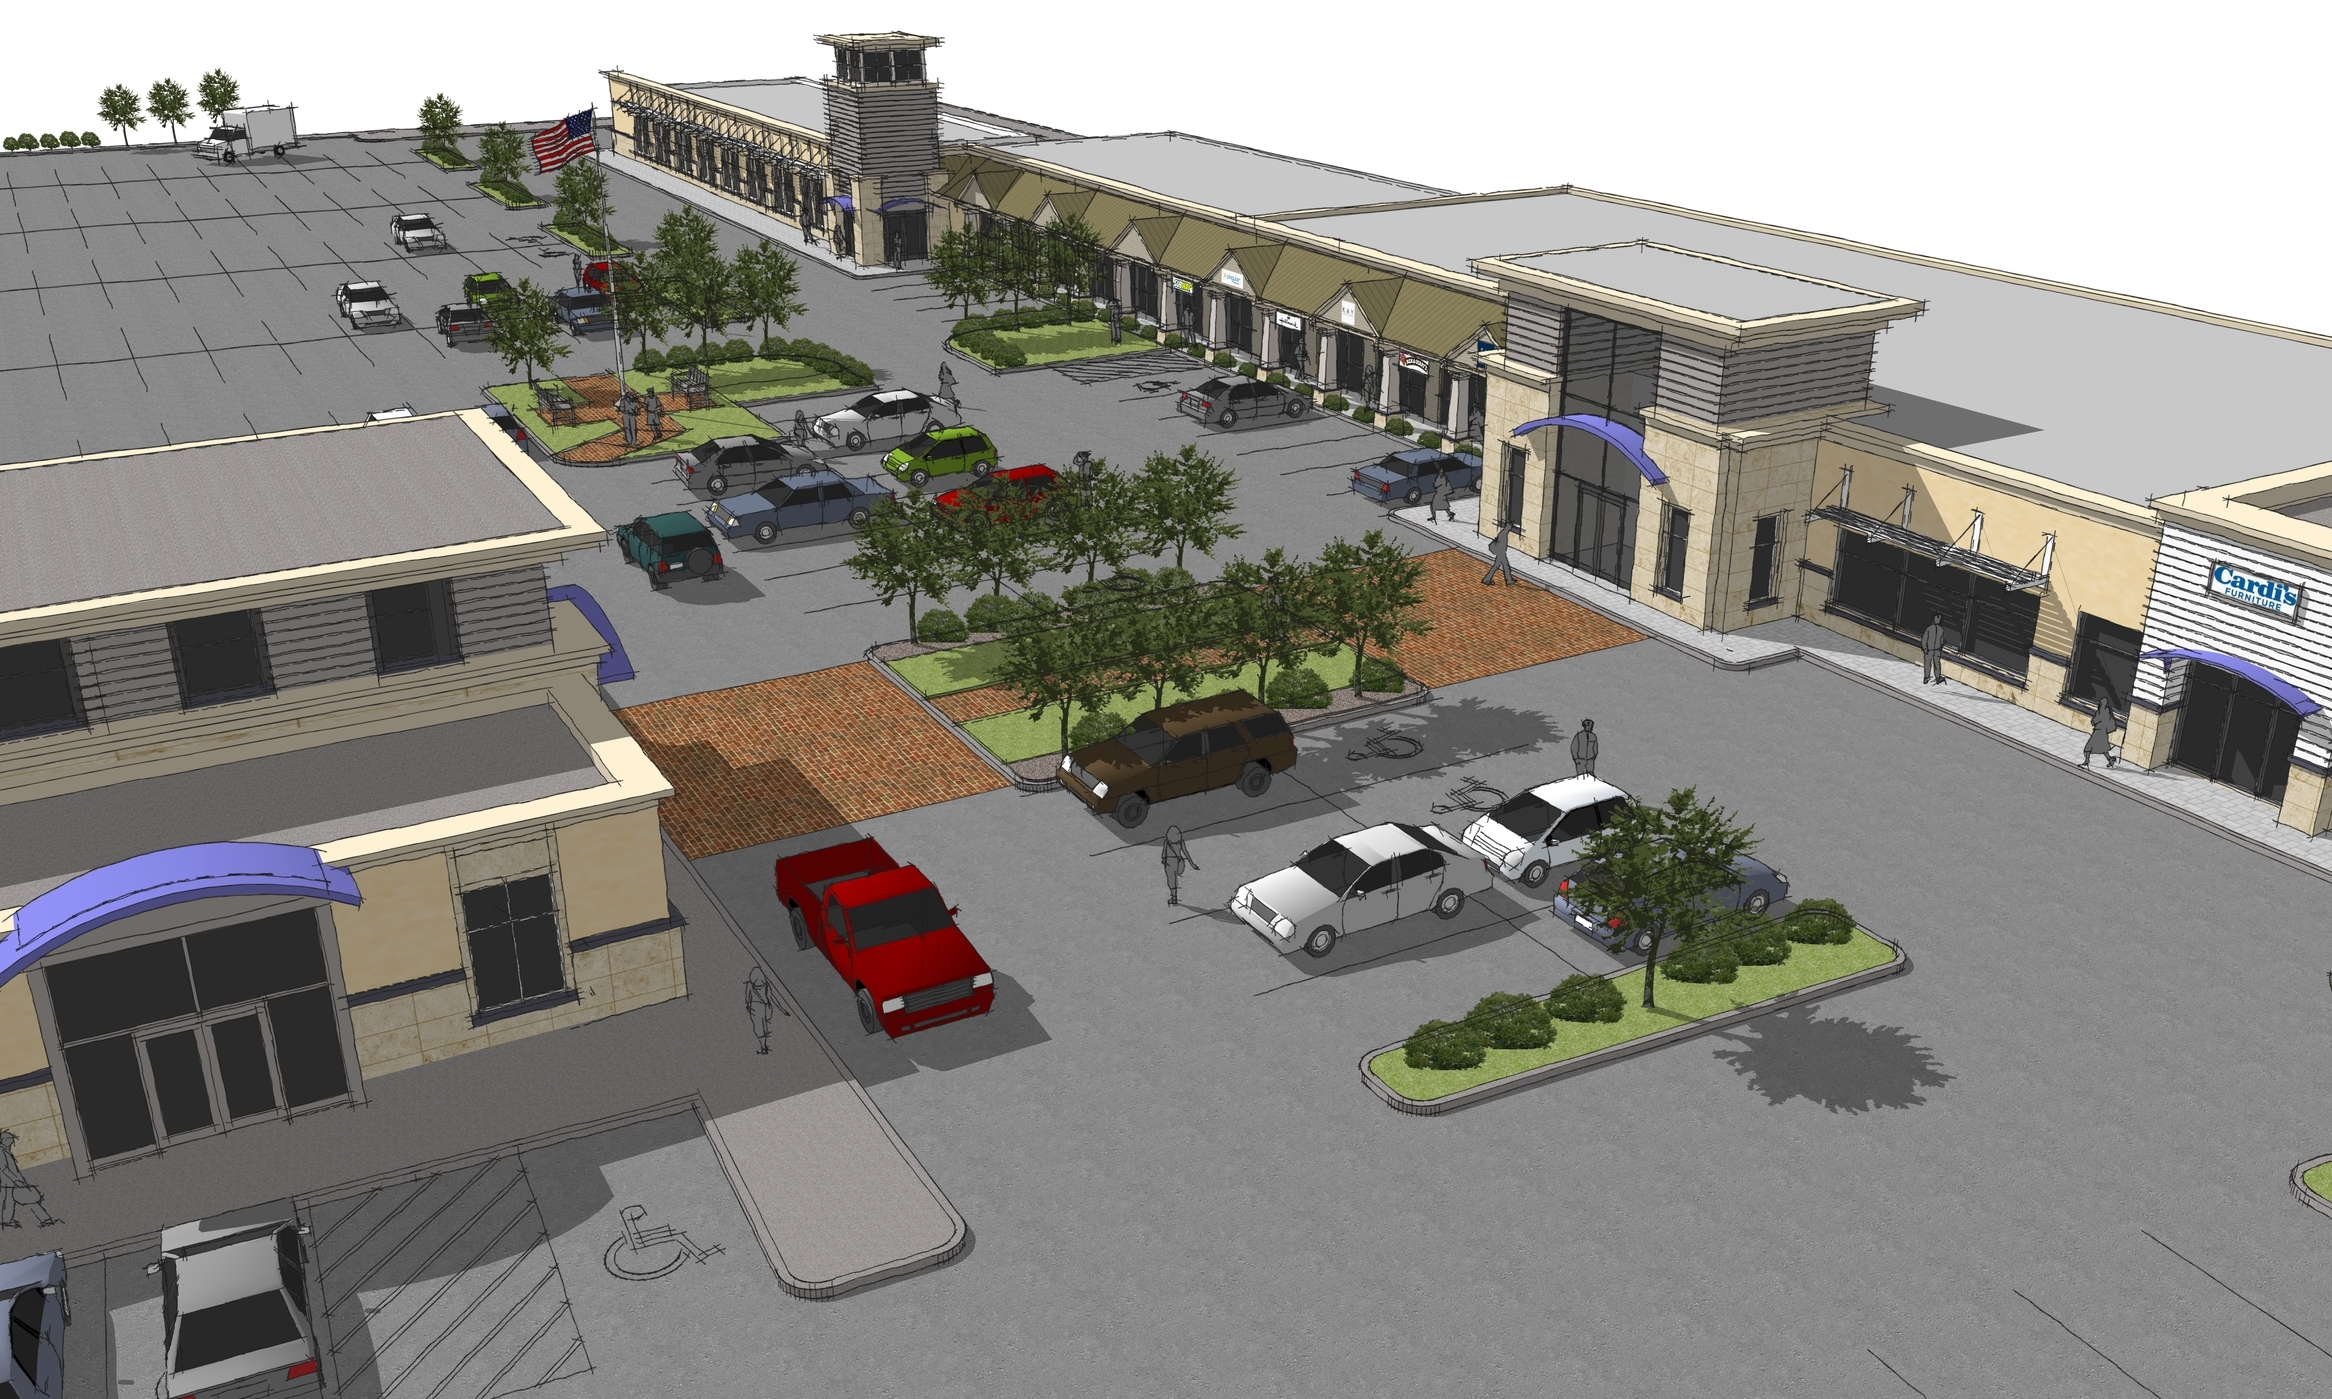 West Main Shopping Center